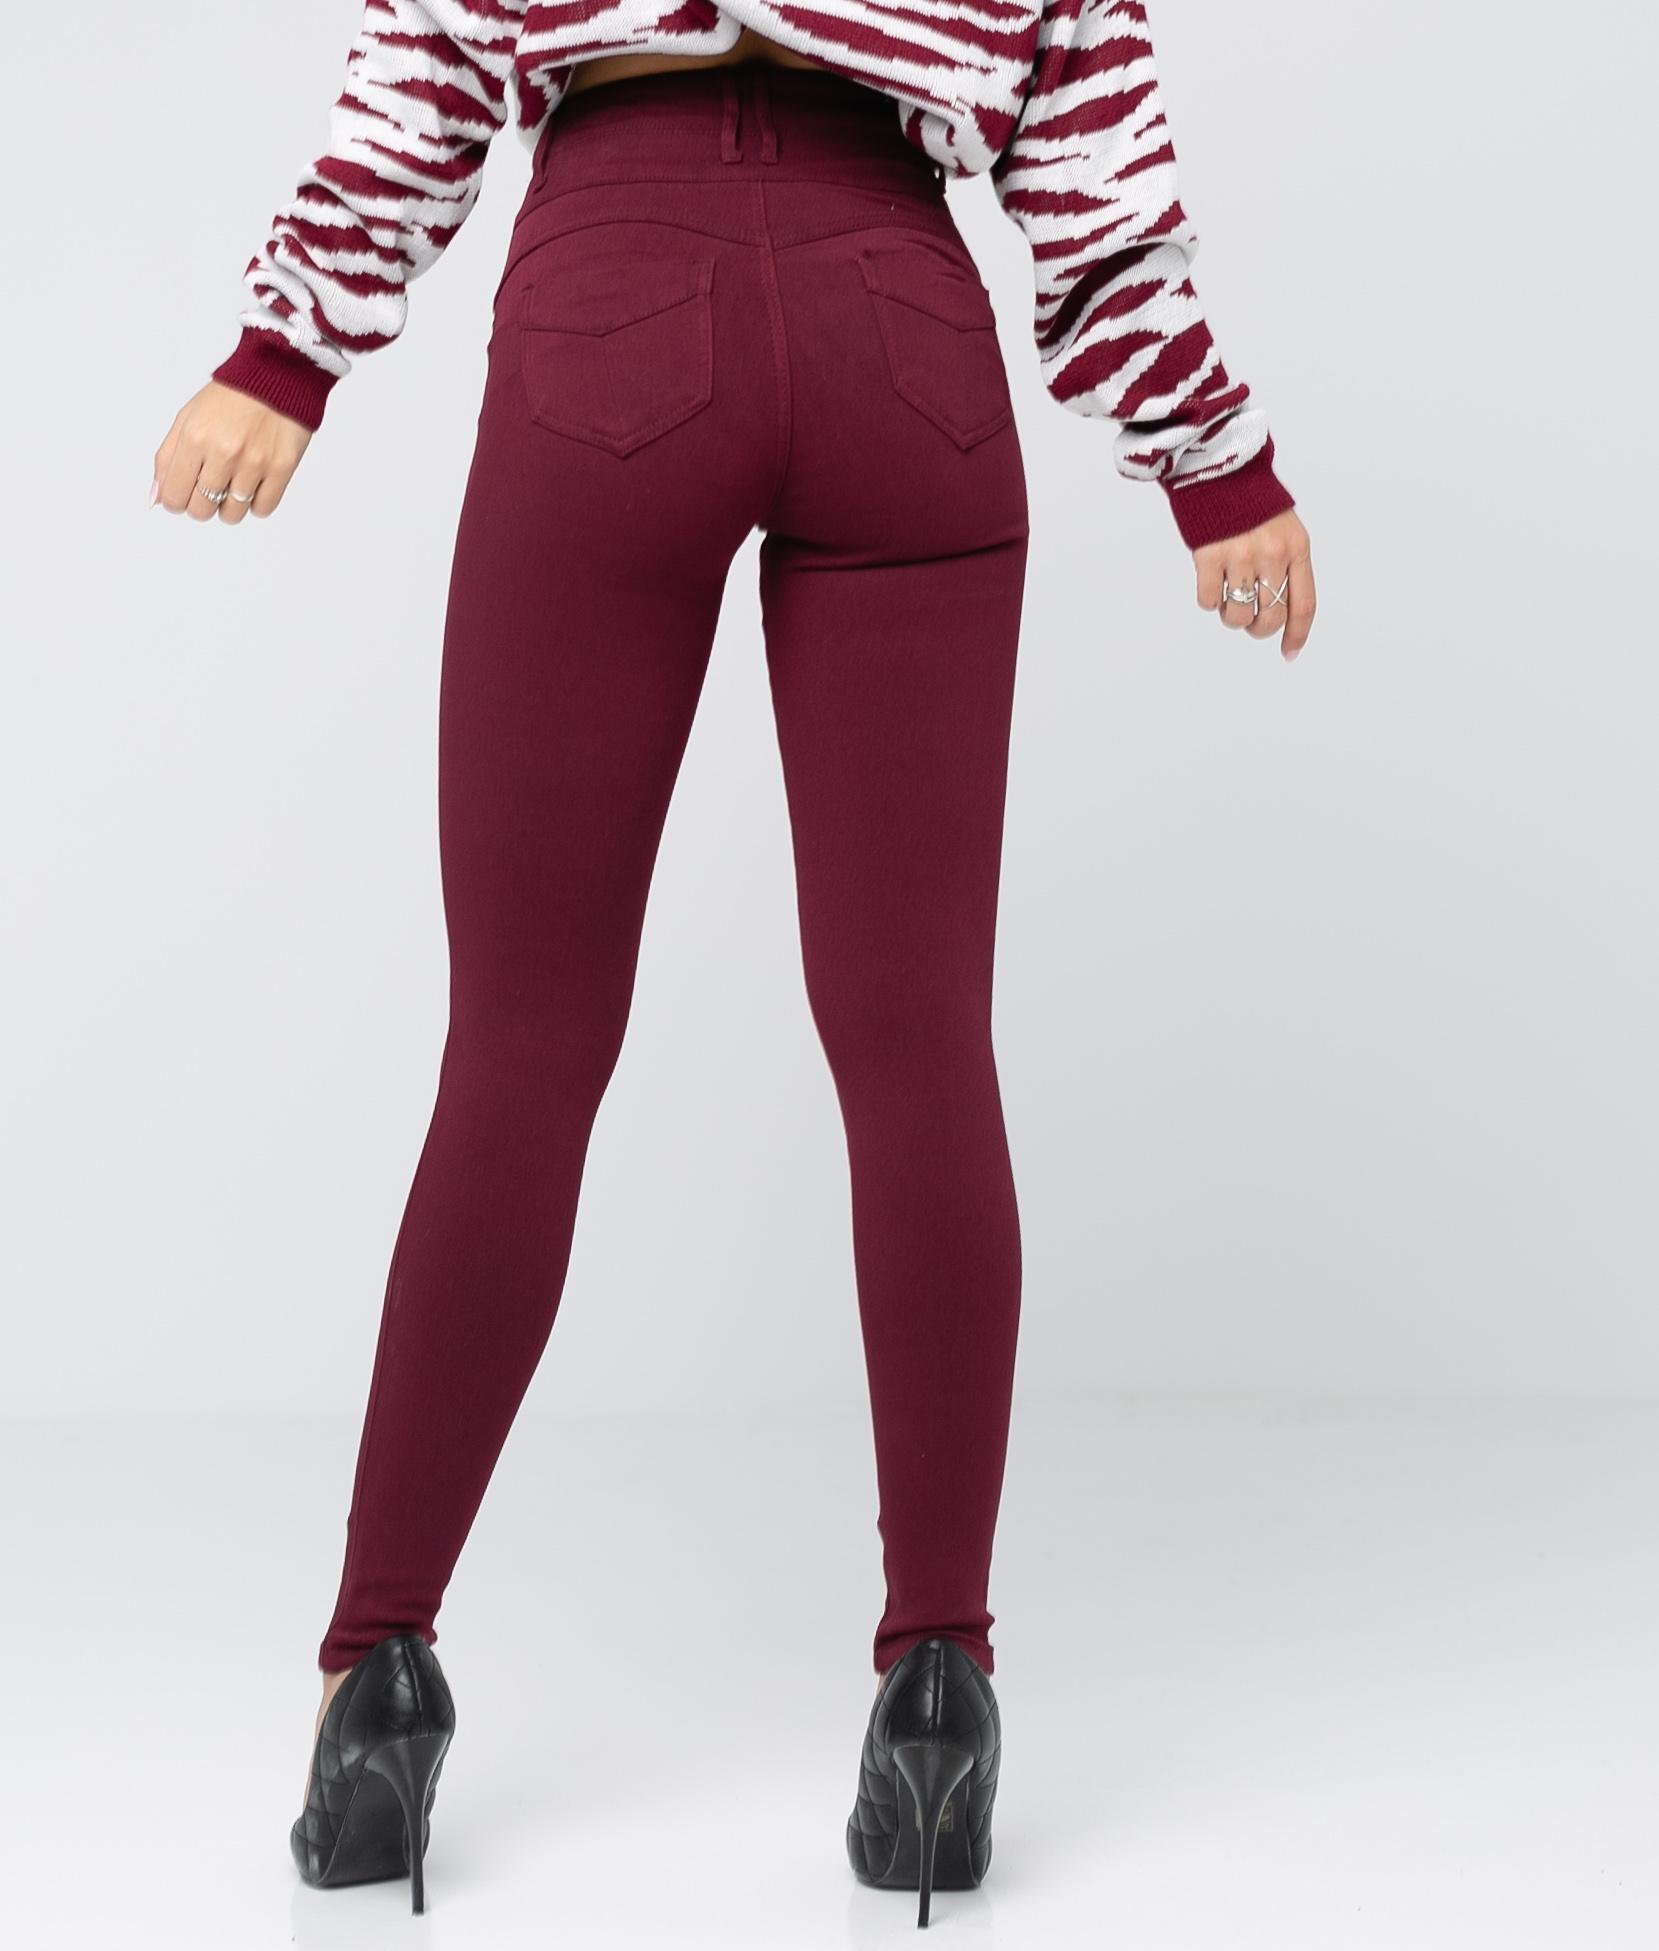 Pantaloni Subama - Granate